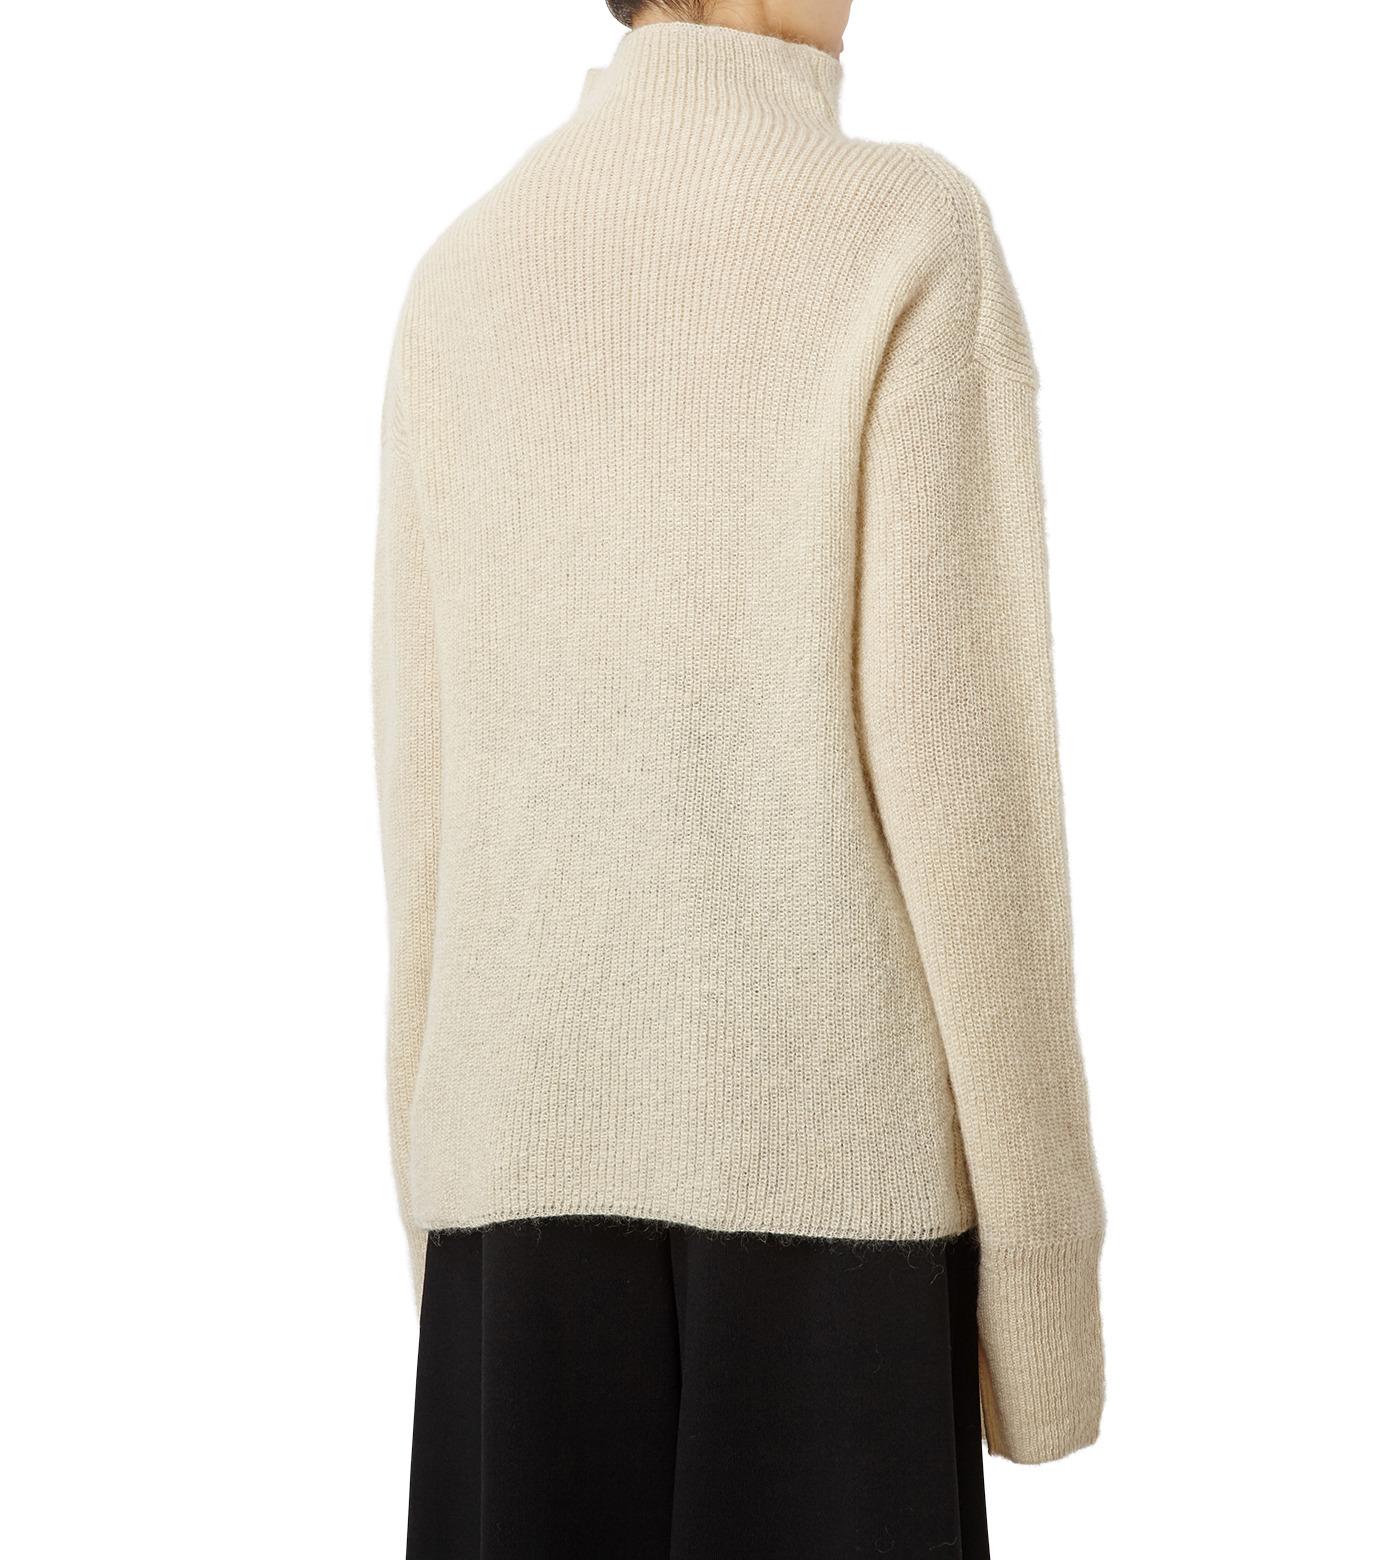 LE CIEL BLEU(ルシェルブルー)のシルクモヘヤニットトップス-WHITE(ニット/knit)-18A61528 拡大詳細画像2